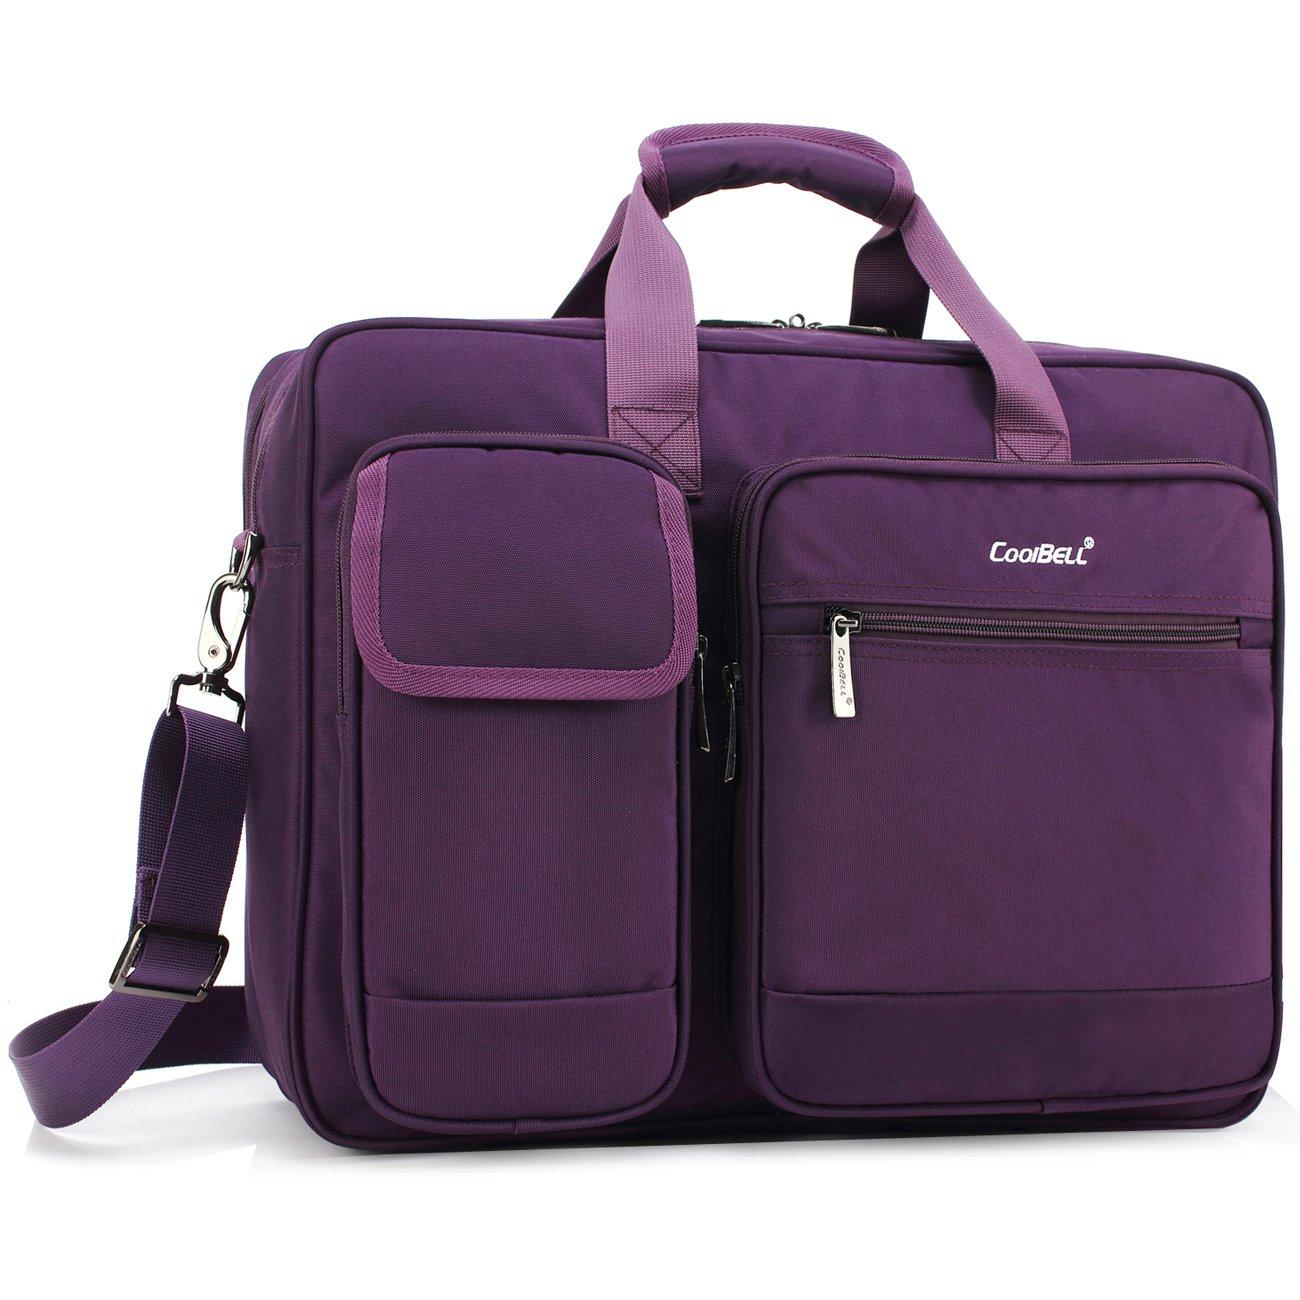 morado morado 17.3 Inches negro Coolbell 17,3/pulgadas port/átil malet/ín bolsa de mensajero protectora Nylon bolsa de hombro multifuncional bolso de mano para port/átil//Ultrabook//tablet//MacBook//Dell//HP//